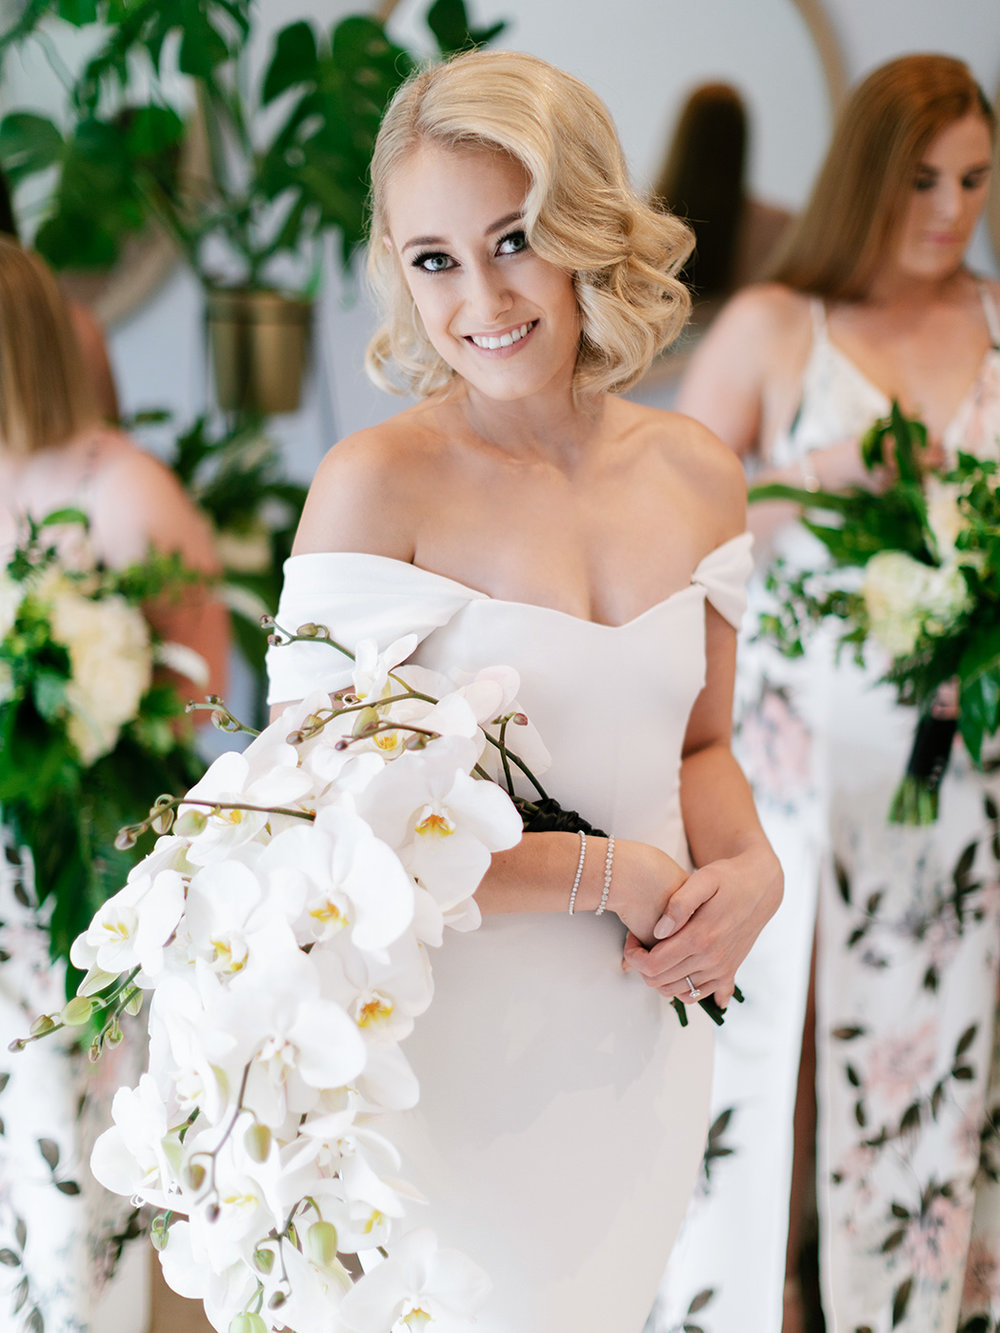 Bride Bouquet | Rensche Mari Photography